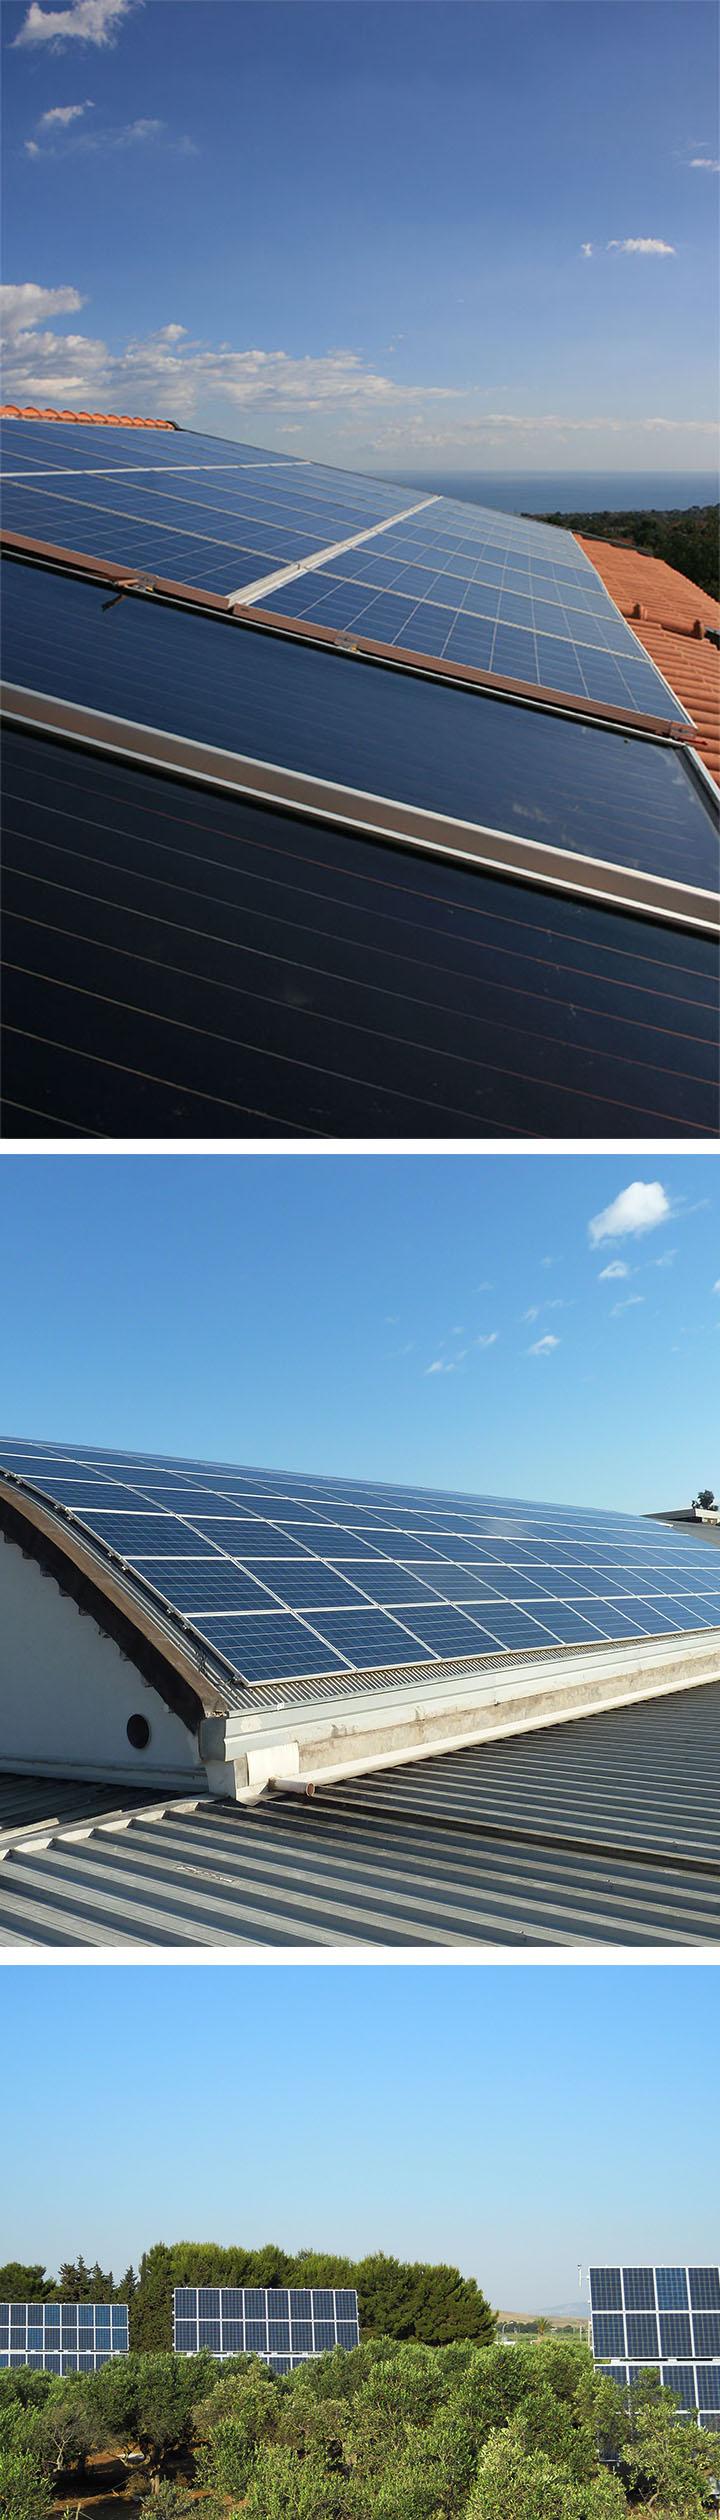 fotovoltaika_heckert_Nemo_realizacie